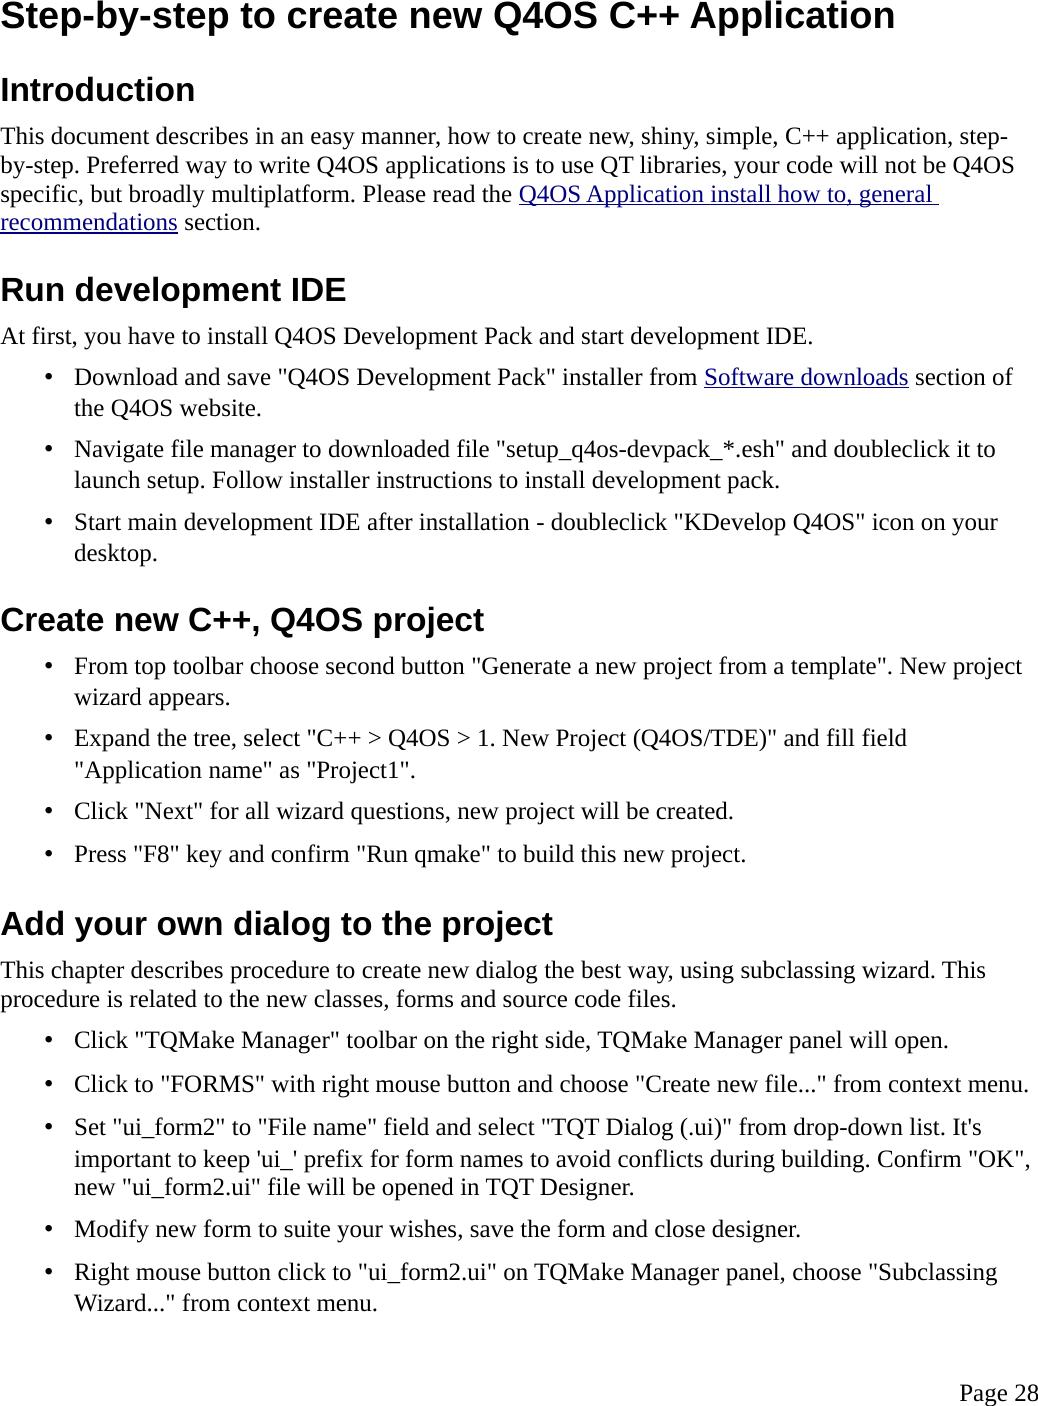 Q4OS User Manual guide